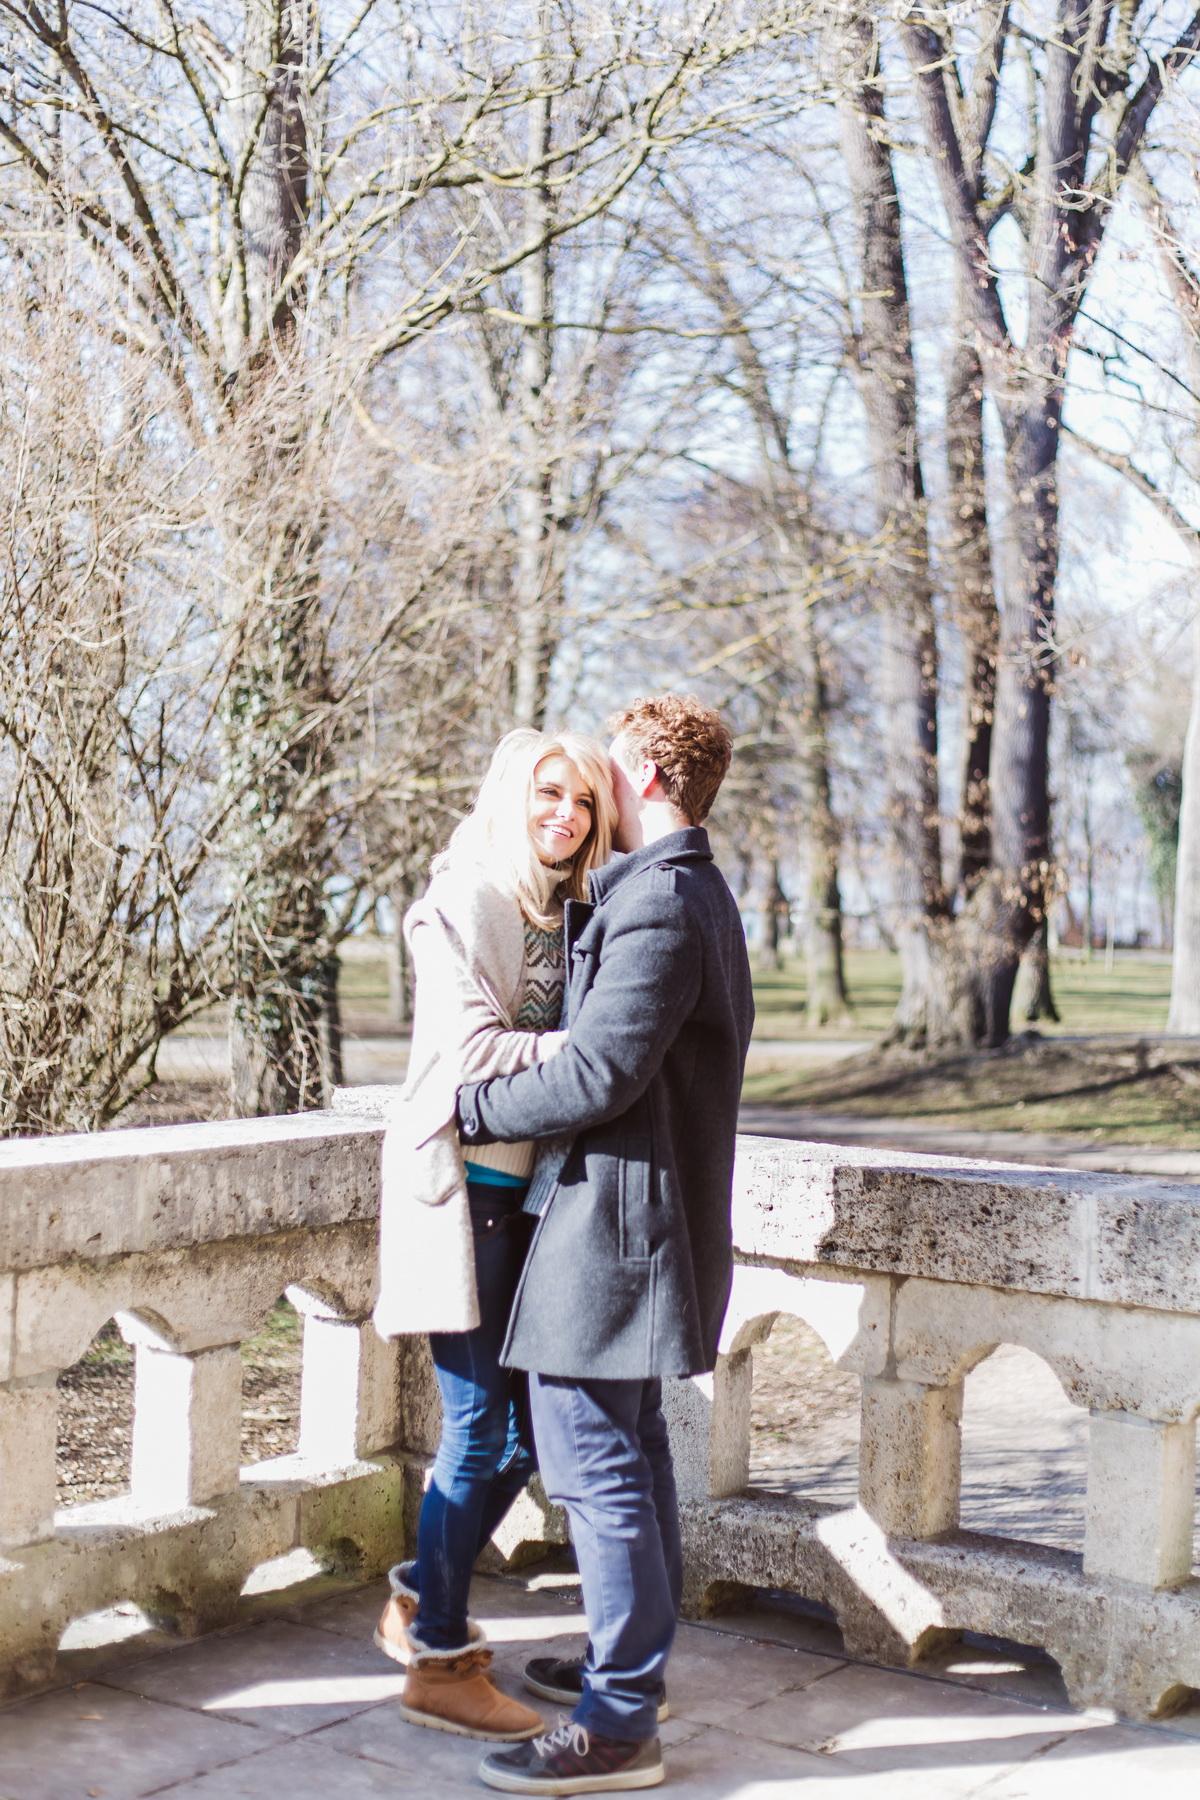 Loveshoot - Julia und Stefan - Claudia Sittig Photography - Lake Ammersee IMG_2530